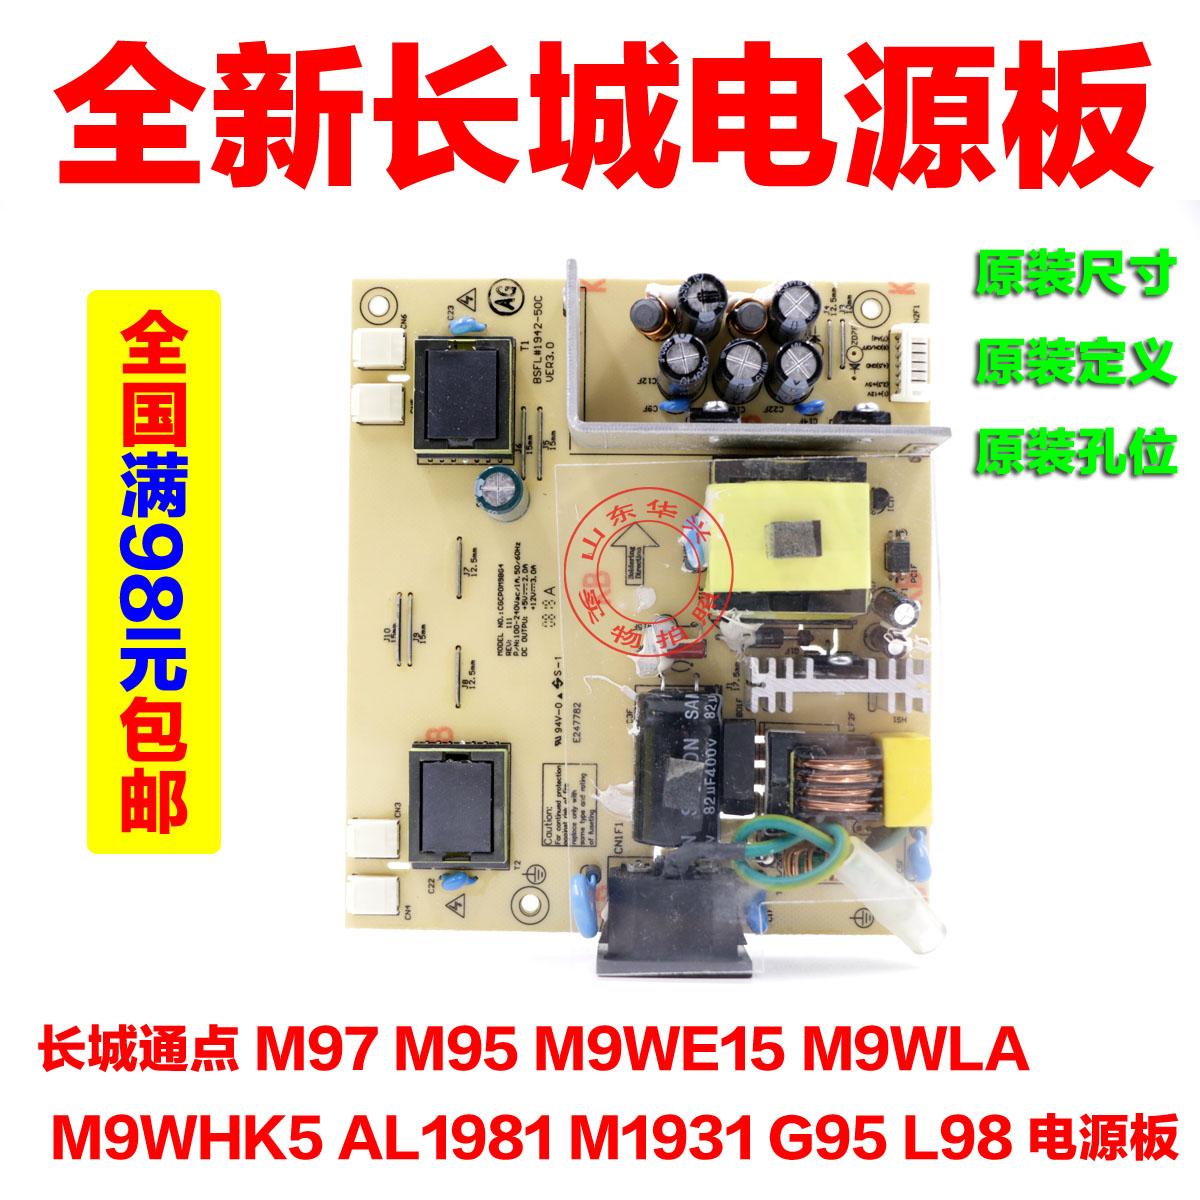 长城 M97 M95 M9WE15 M9WLA M9WHK5 AL1981 M1931 G95 L98 电源板